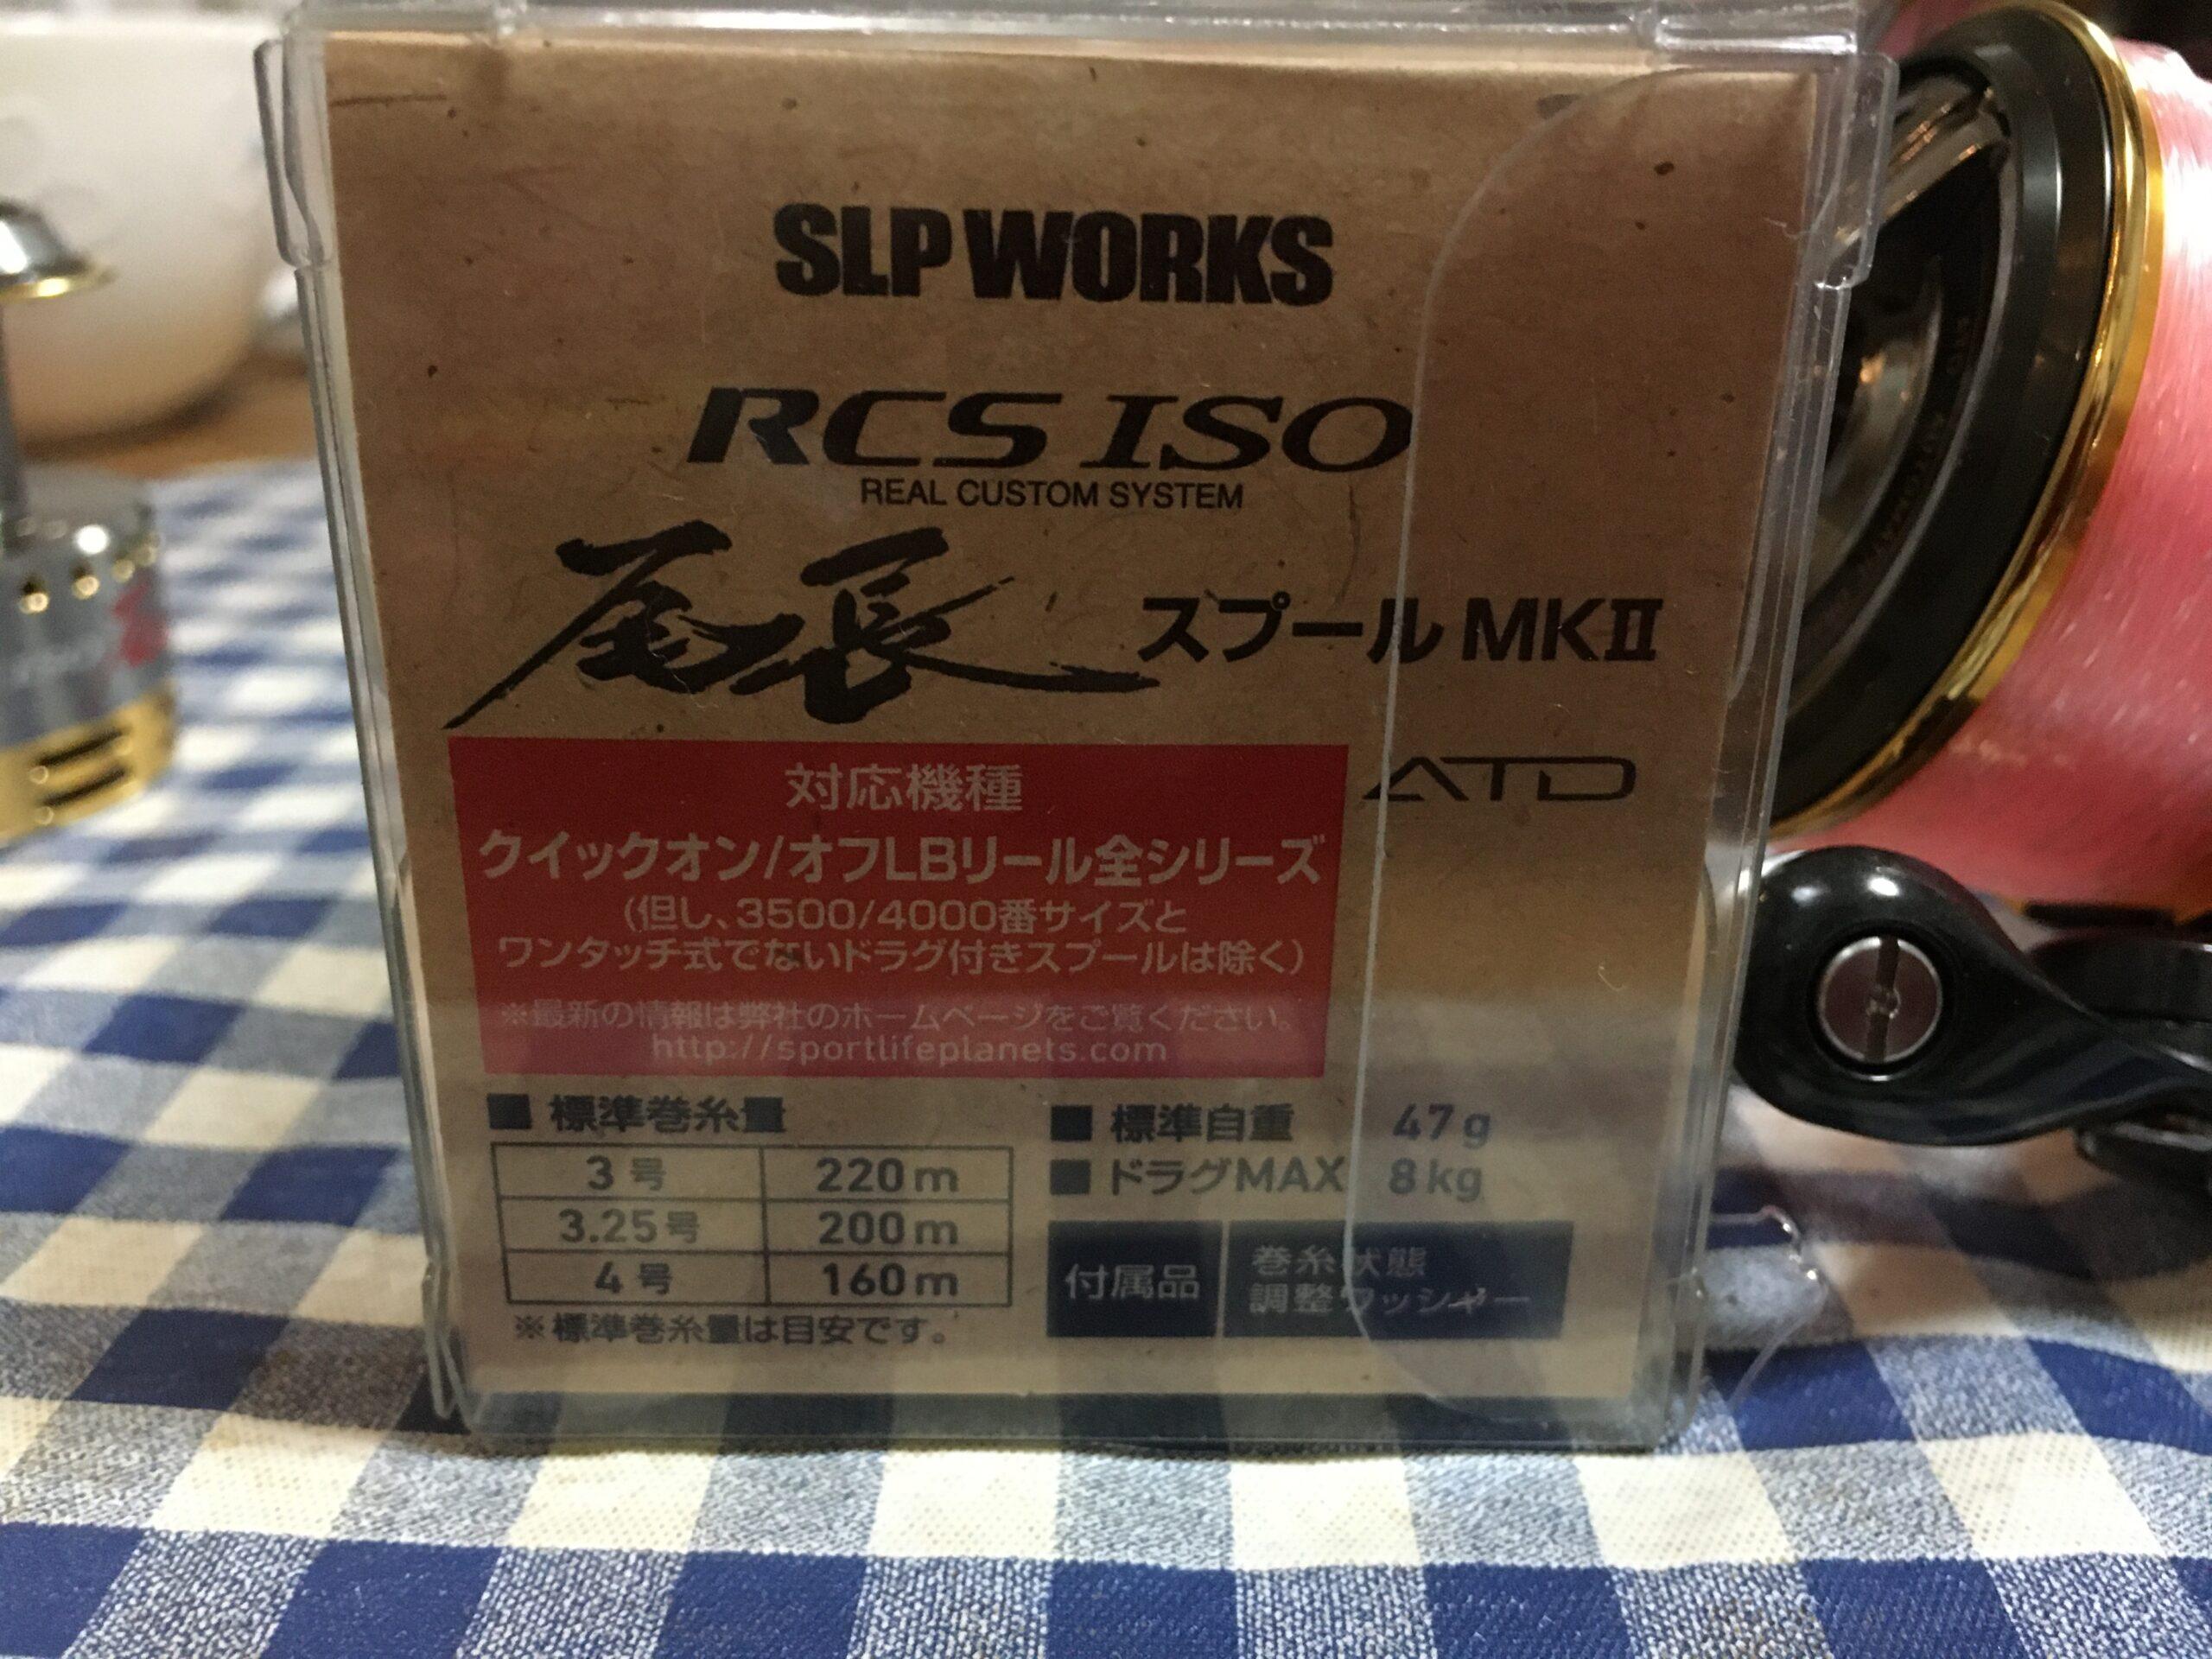 RCS ISO 尾長スプールMKⅡ SLPworks